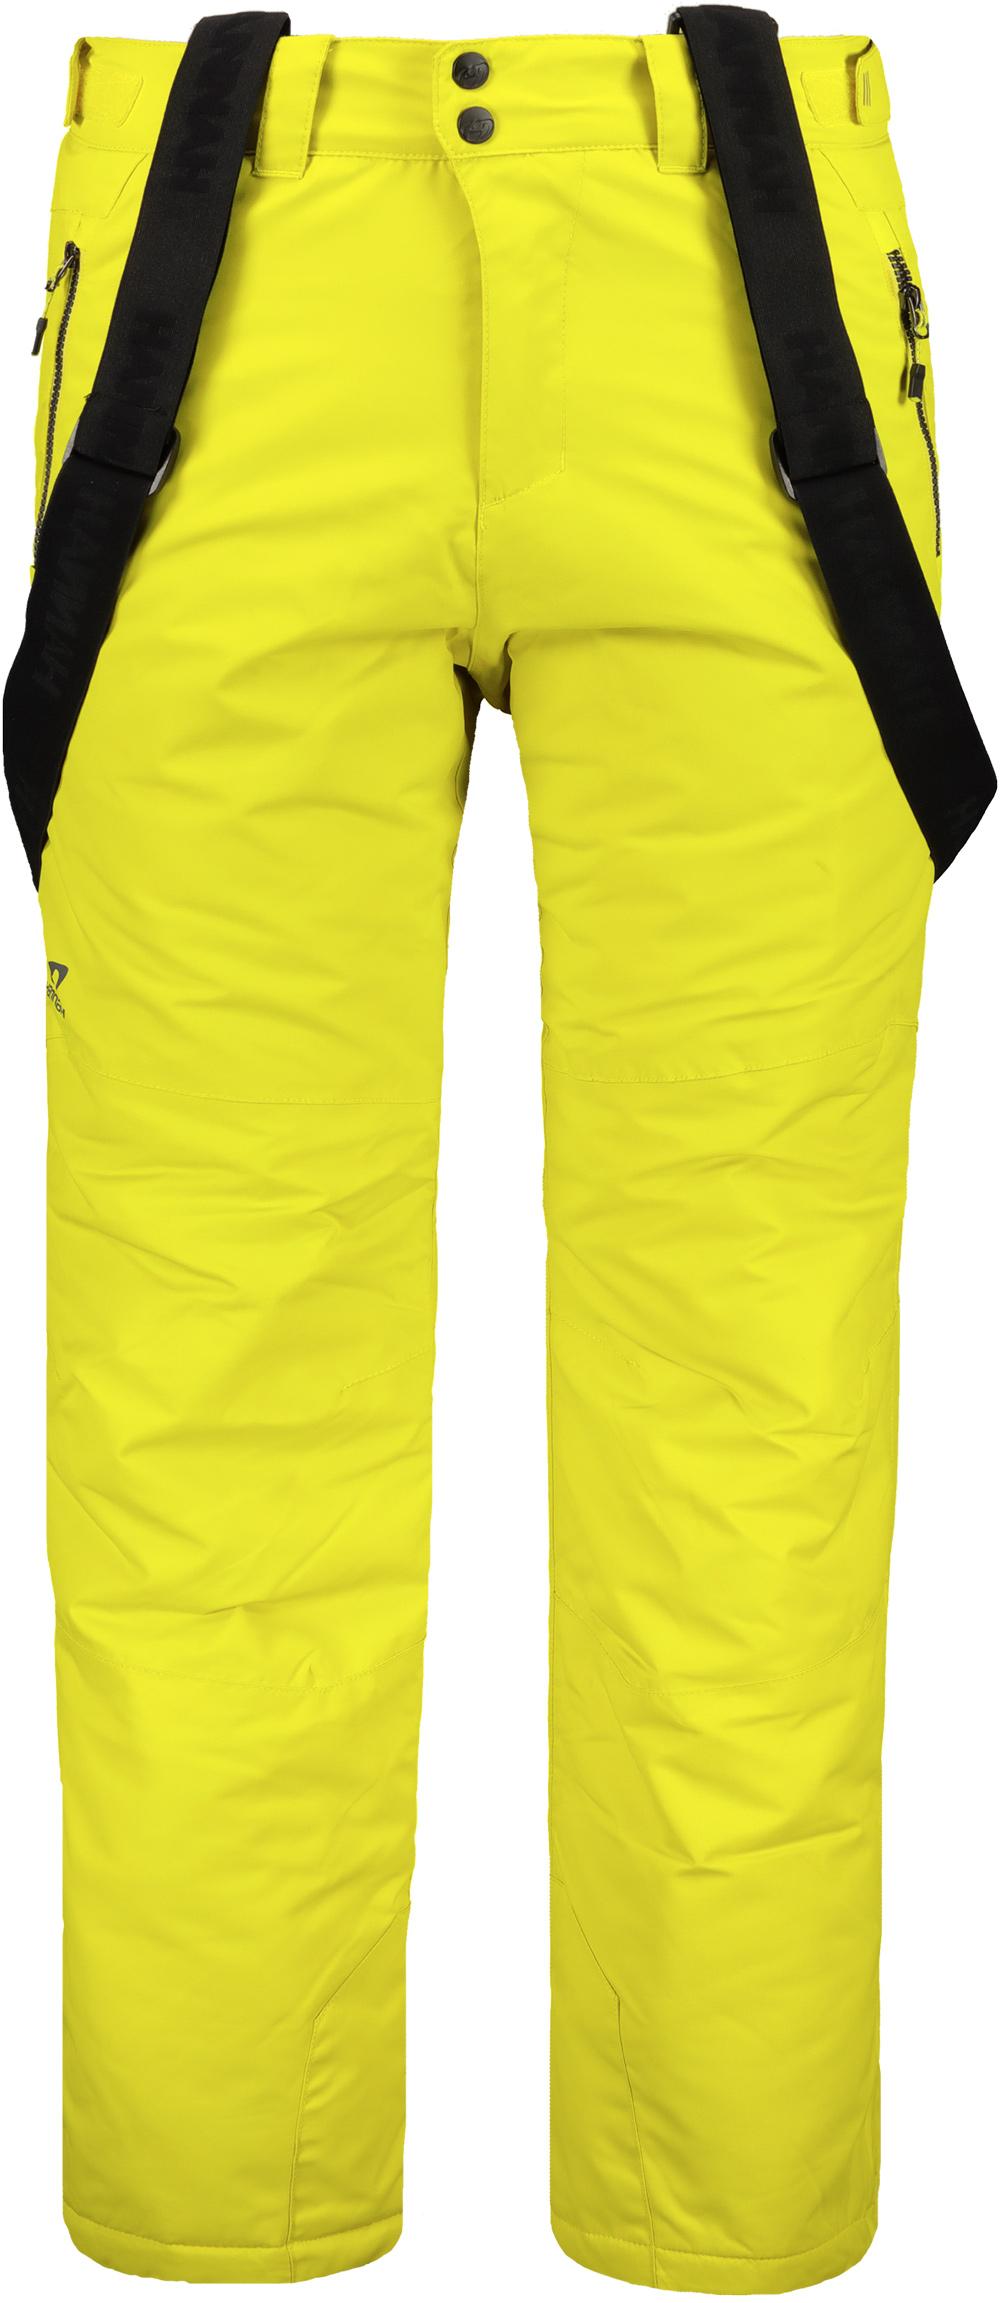 Nohavice lyžiarske pánske HANNAH Jago